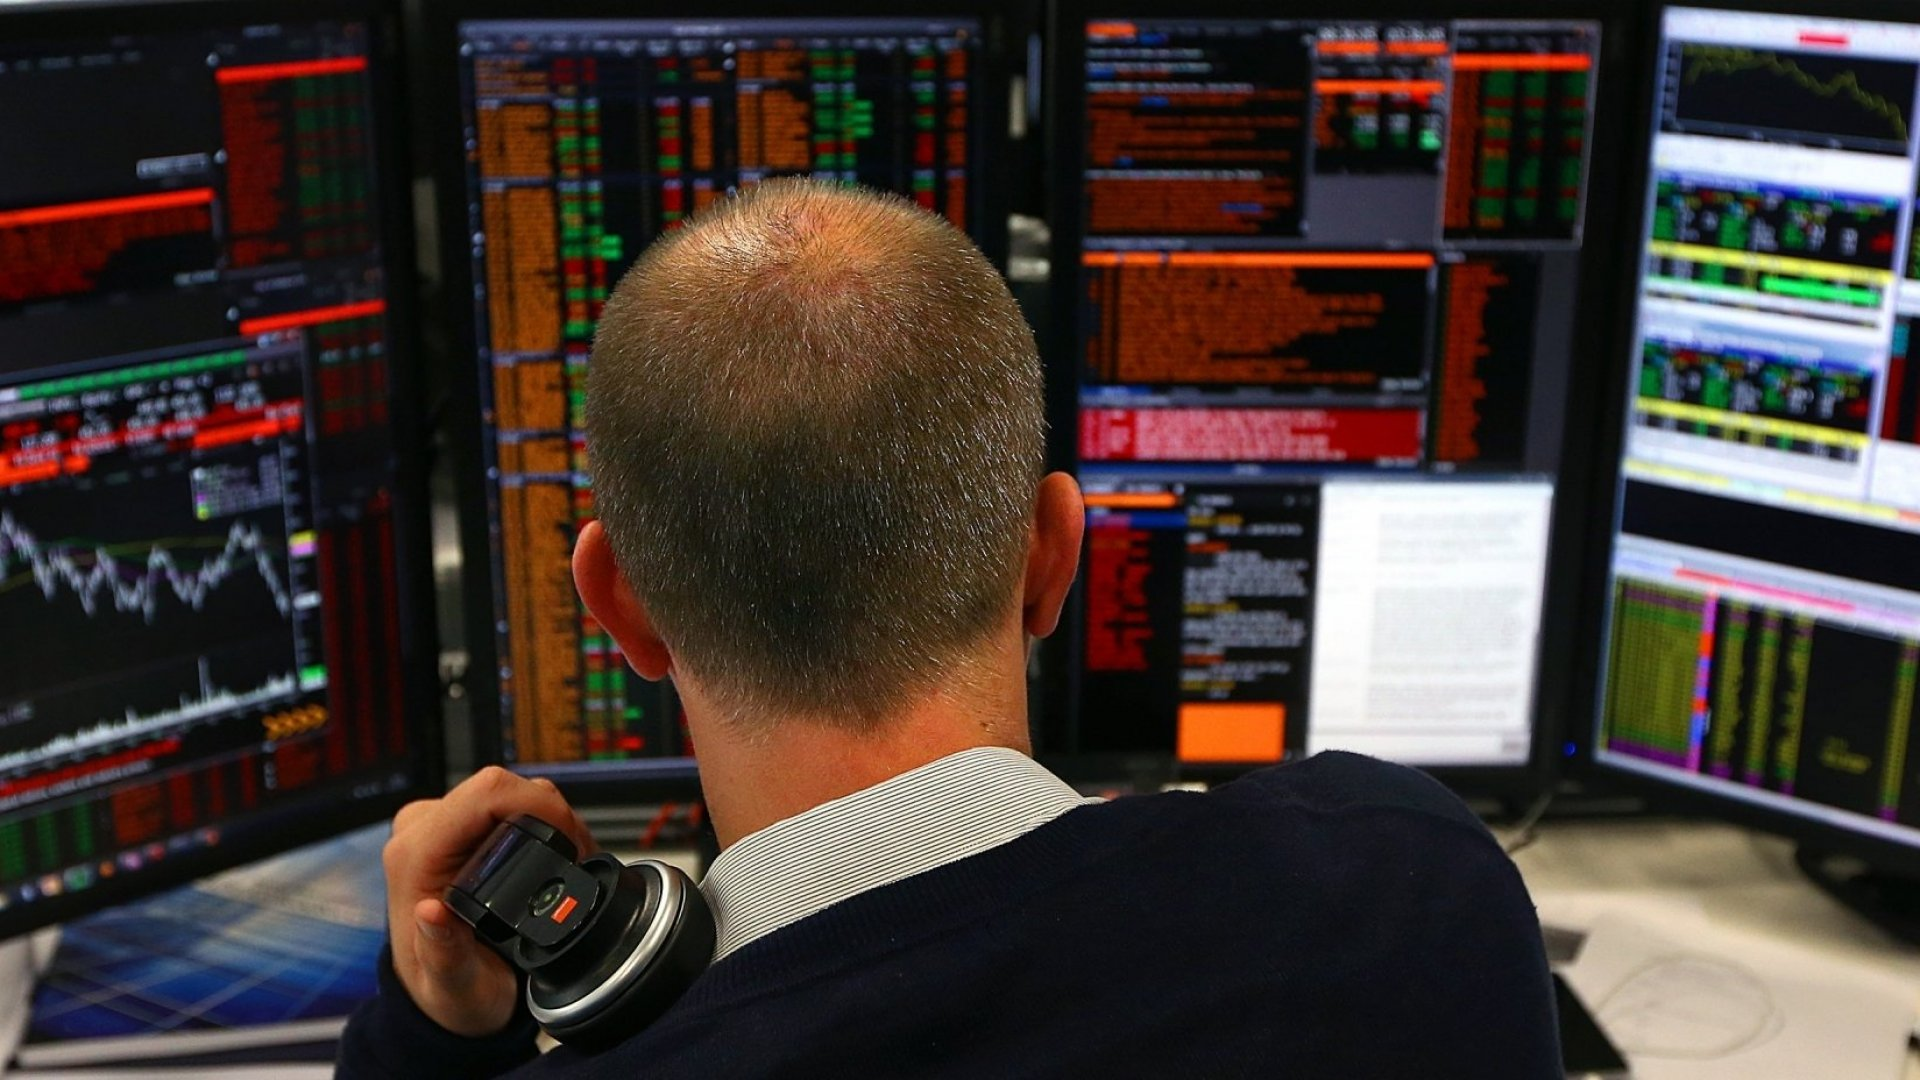 Nutanix Takes $75 Million LoanFrom Goldman Sachs, Postpones IPO (for Now)